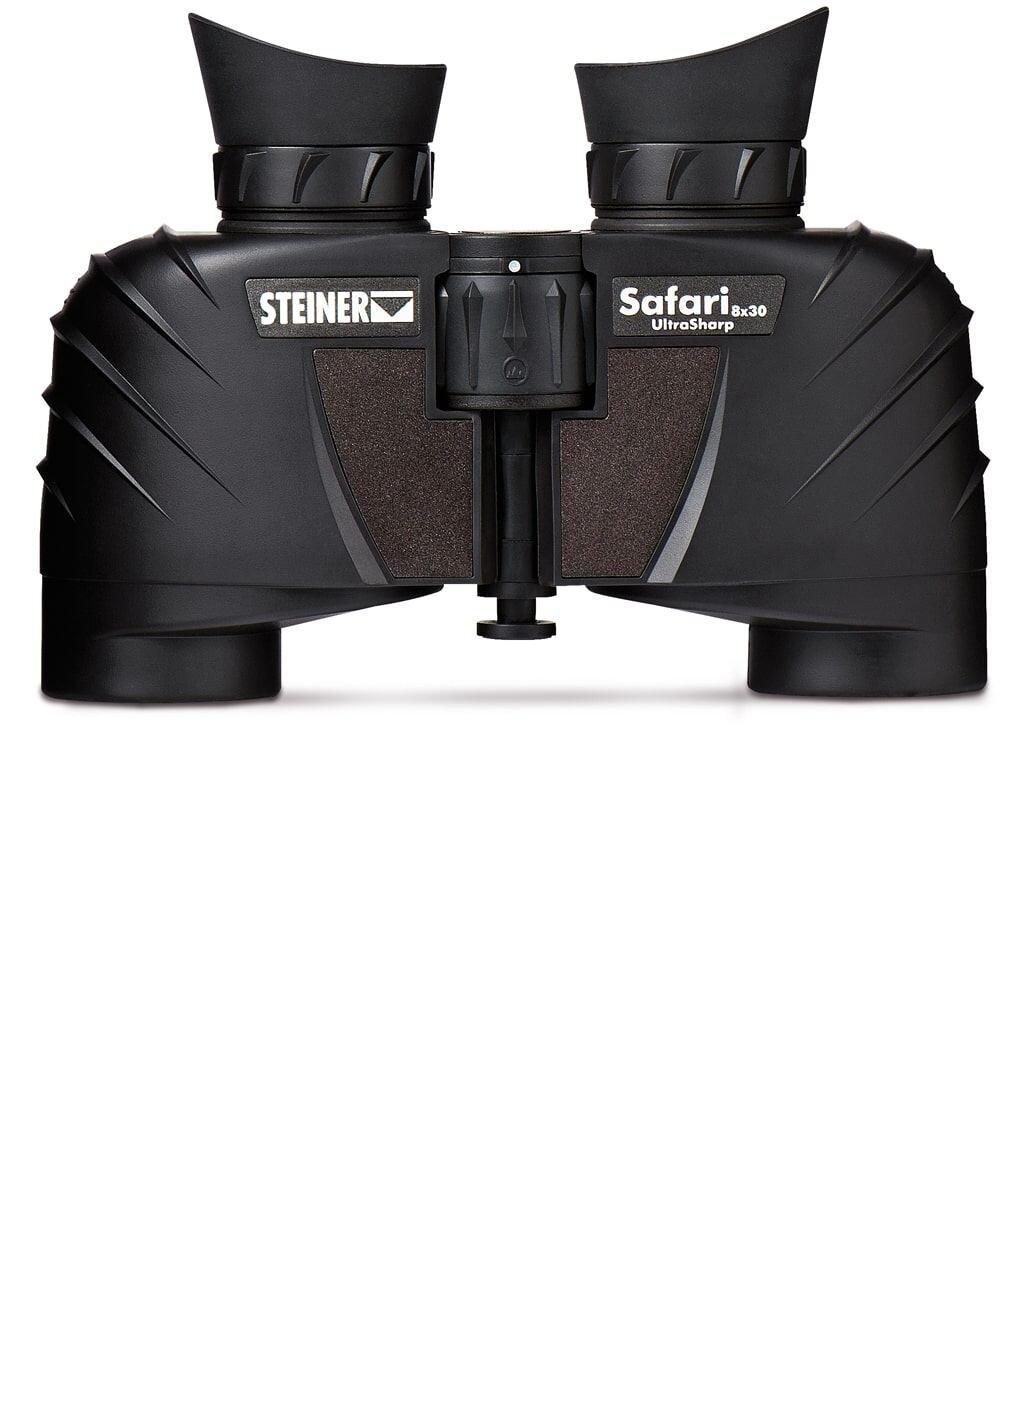 Steiner Safari UltraSharp 8x30 CF